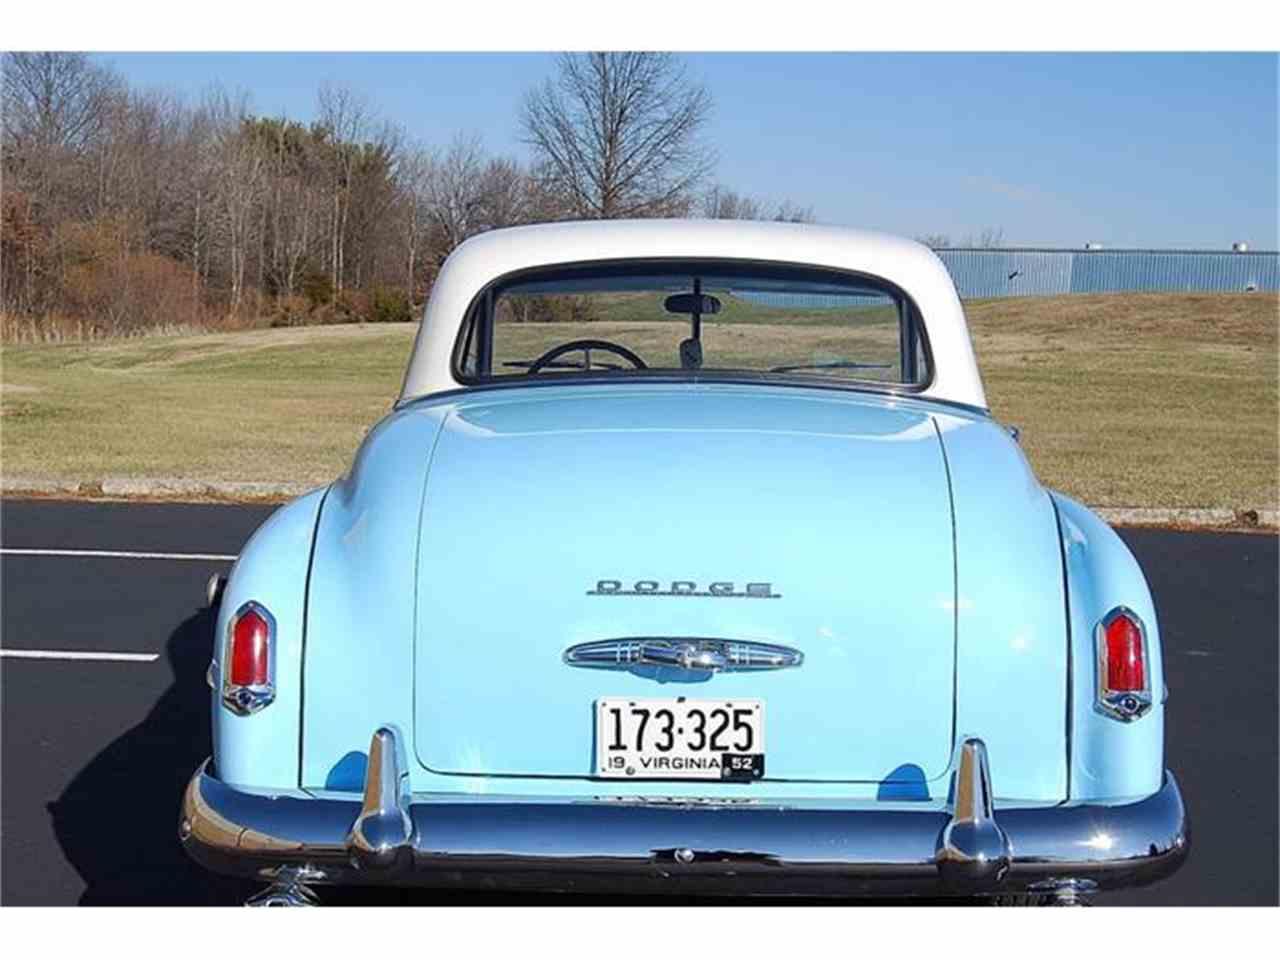 Auto For Sale Fredericksburg Va: 1952 Dodge Wayfarer For Sale